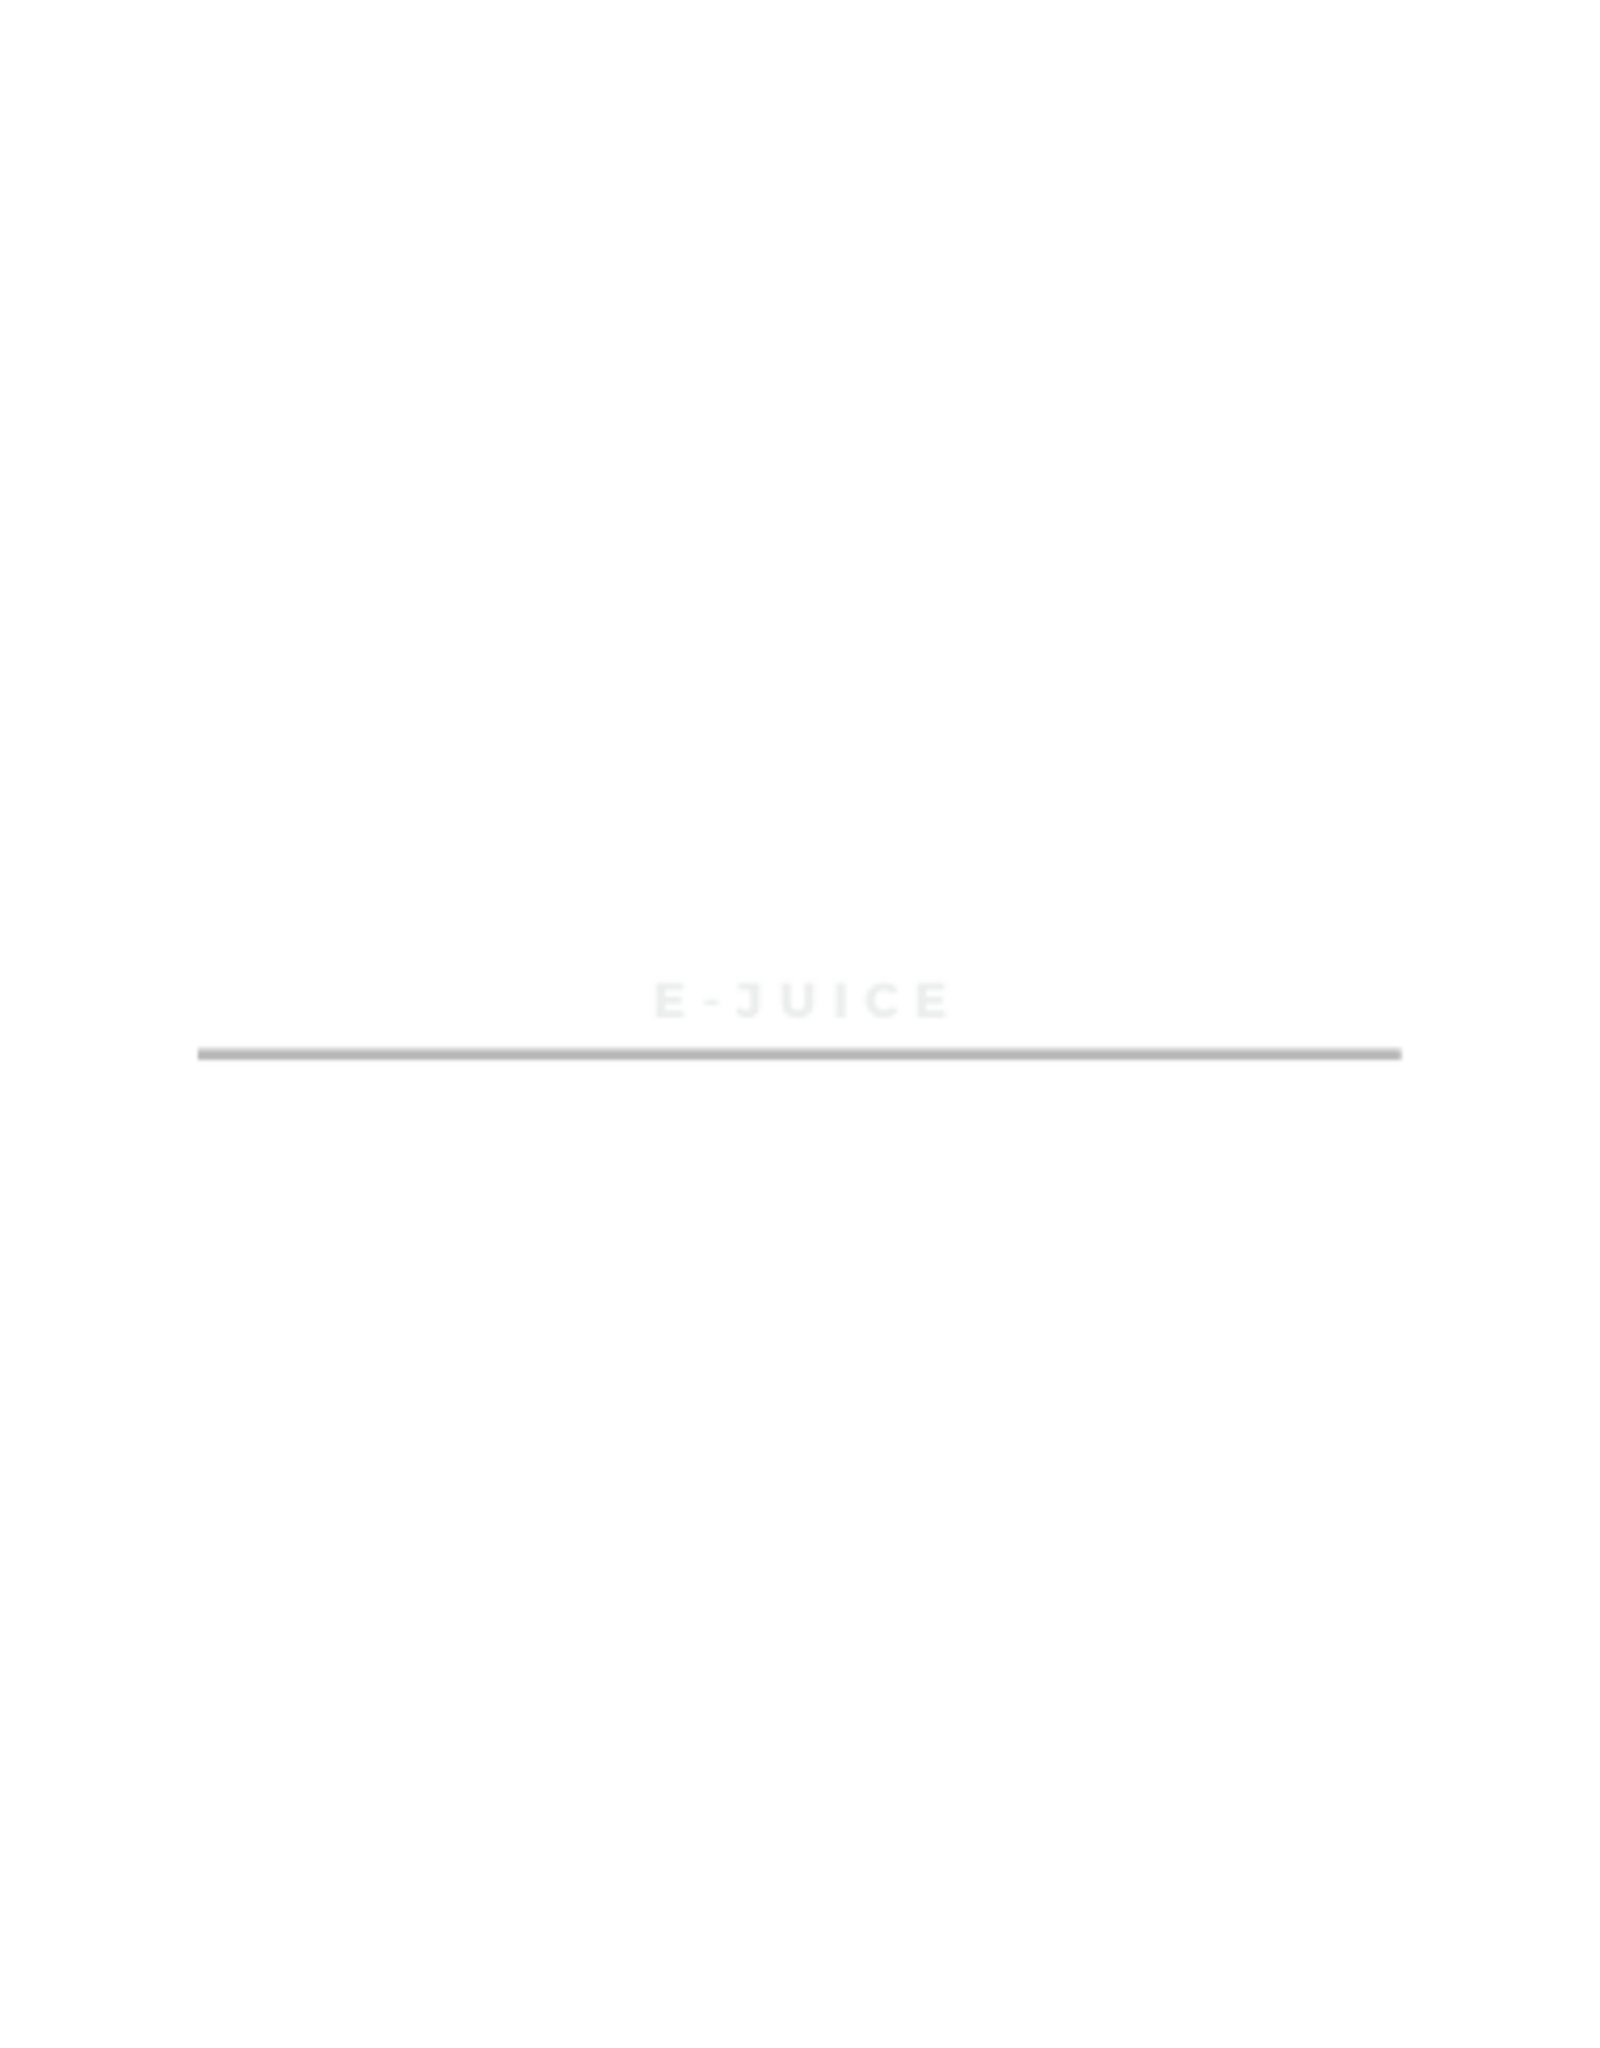 Refined Labs Home Brew Snow Drift E-juice | Salt Nic (30mL)